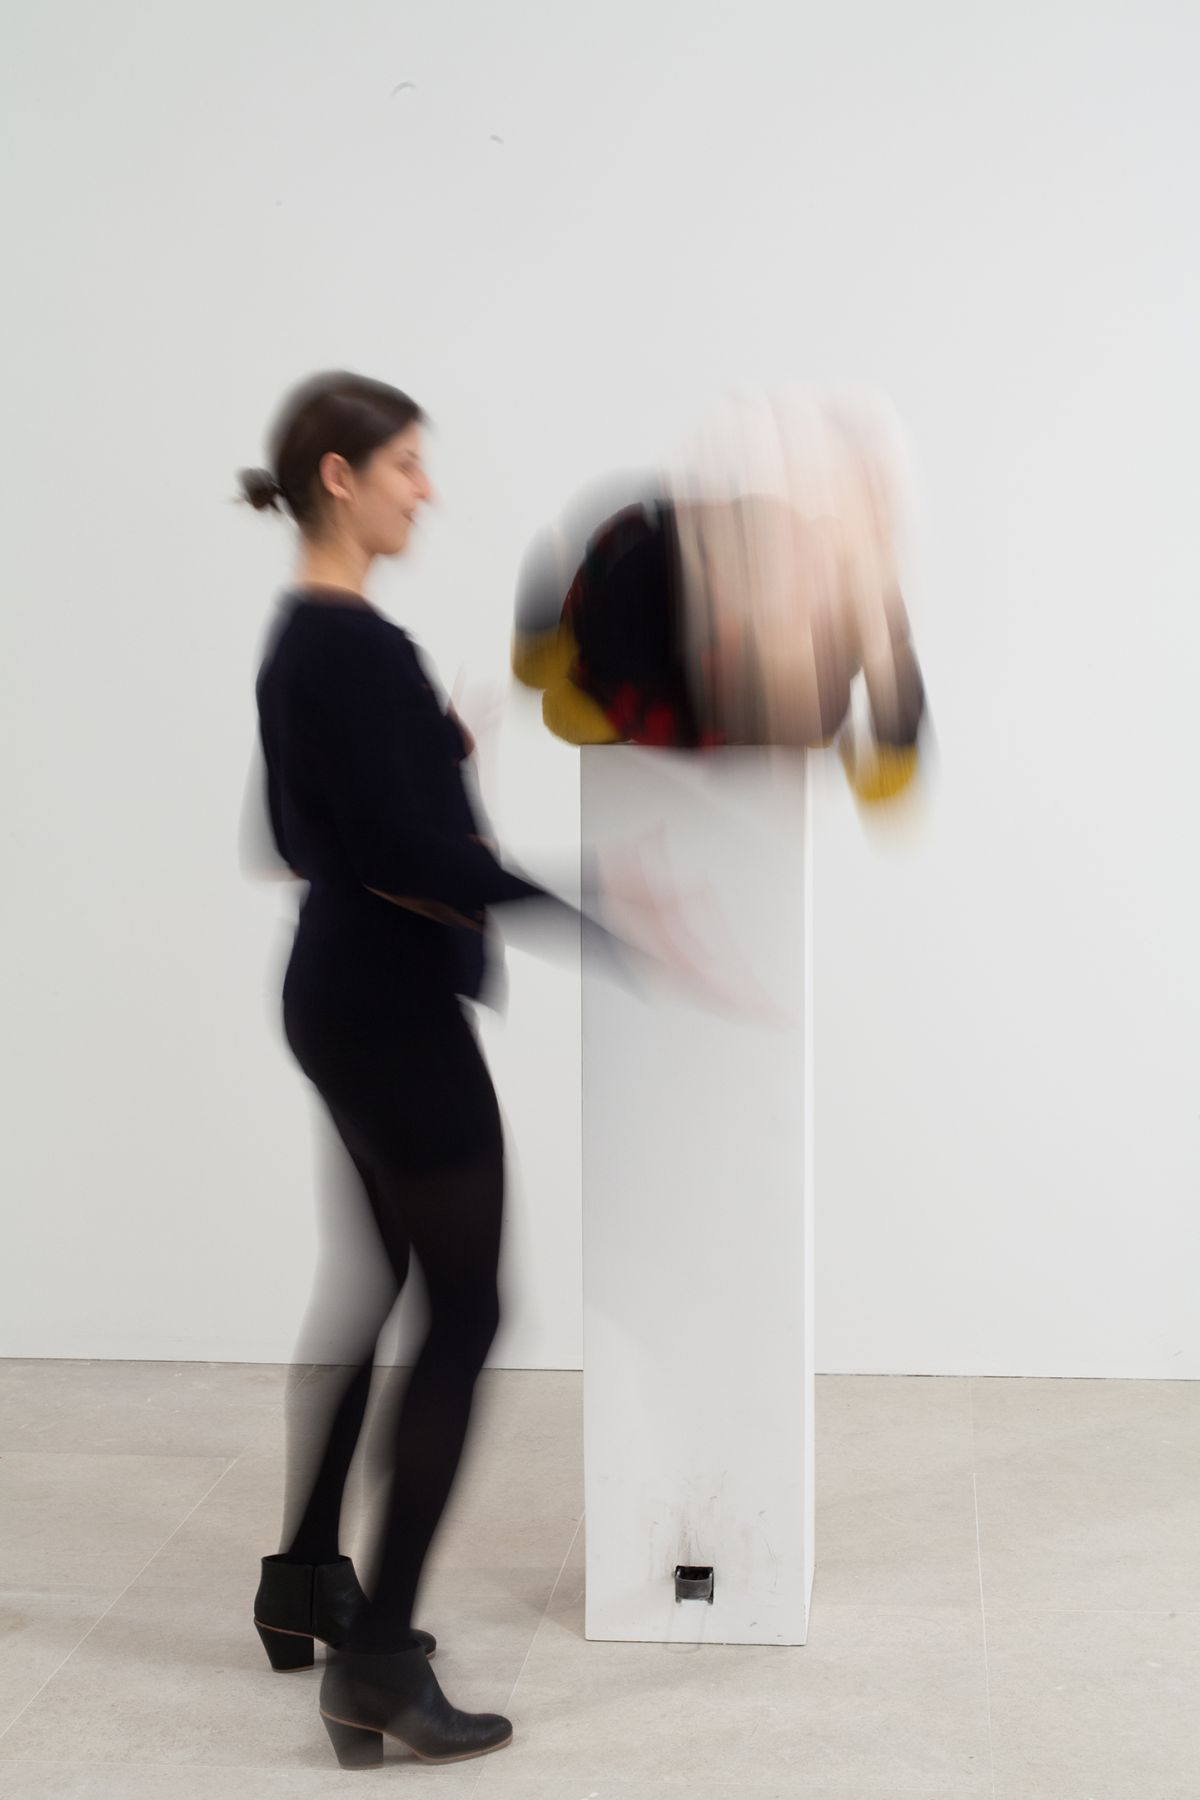 Gelitin, Emma, 2012 ,Mixed media, 70 x 19 1/2 x 16 1/2 inches